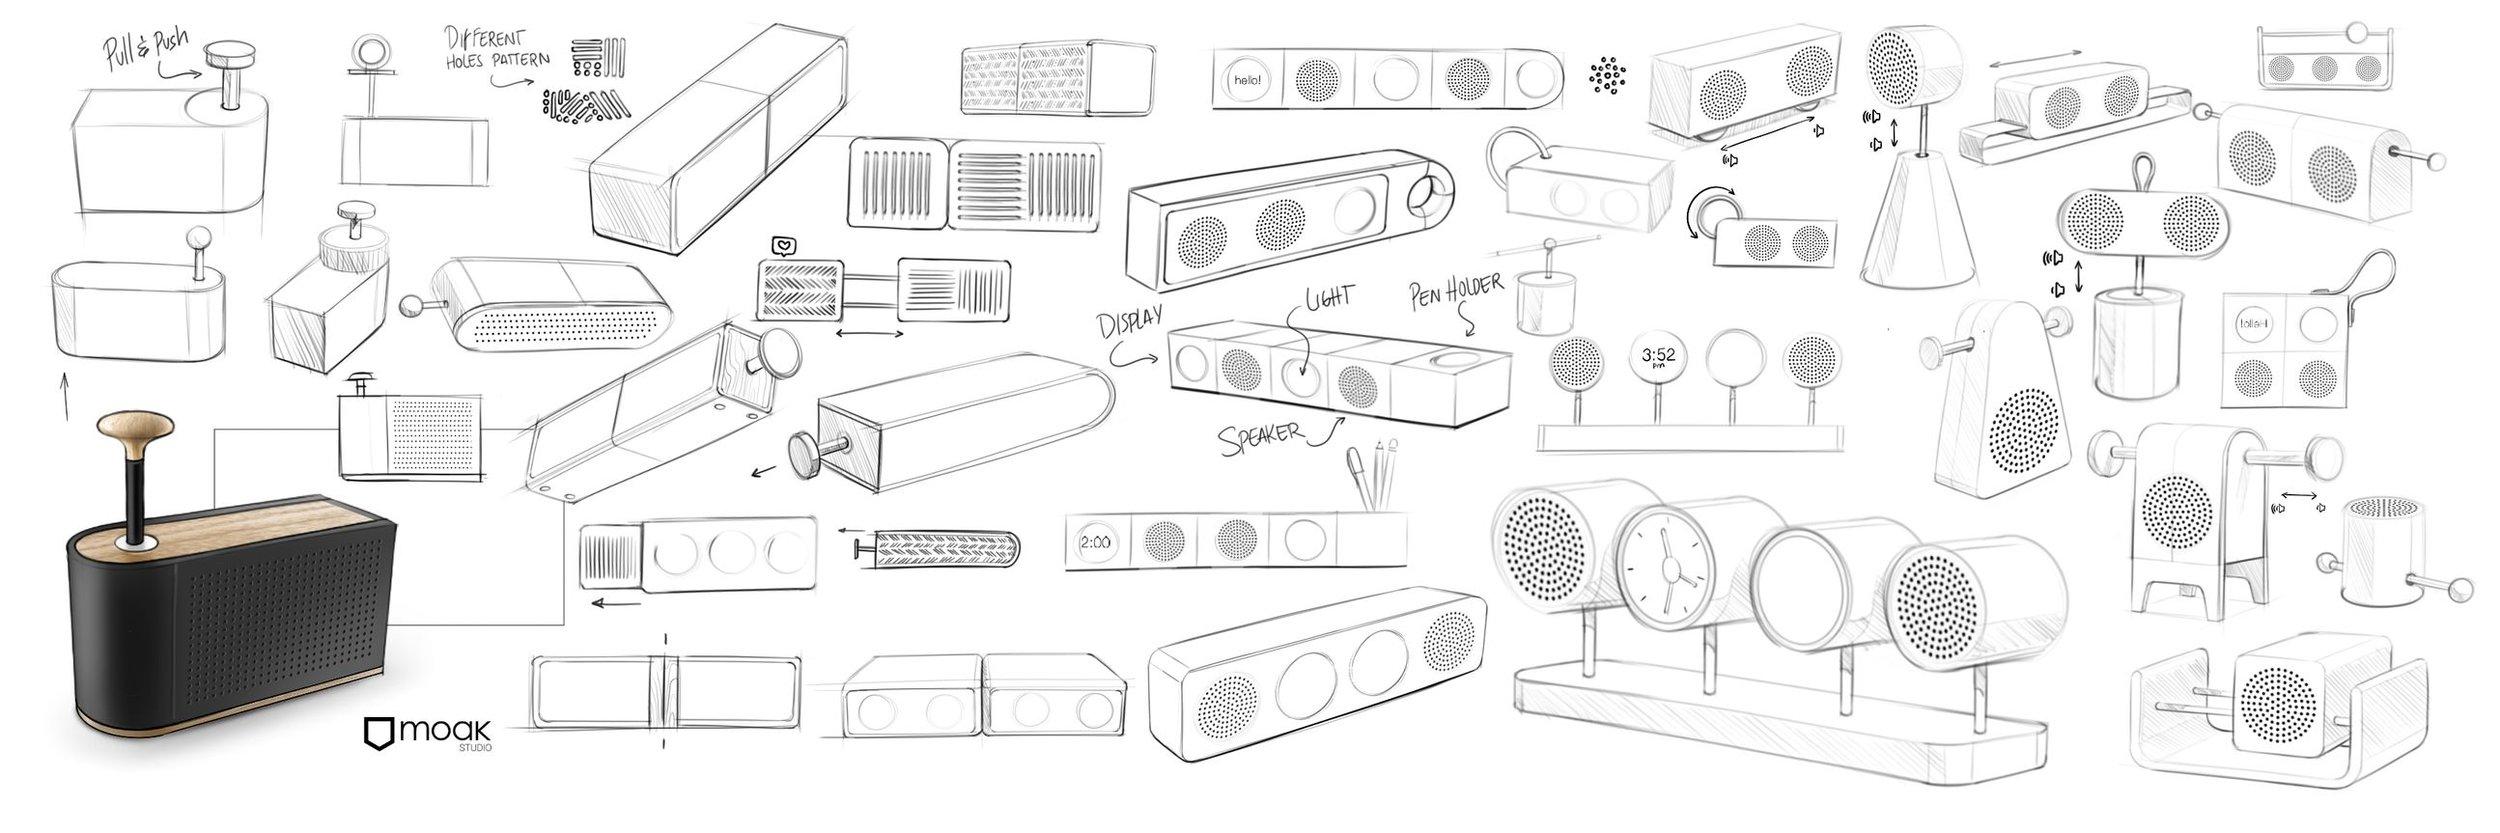 hilo sketches_result.jpg